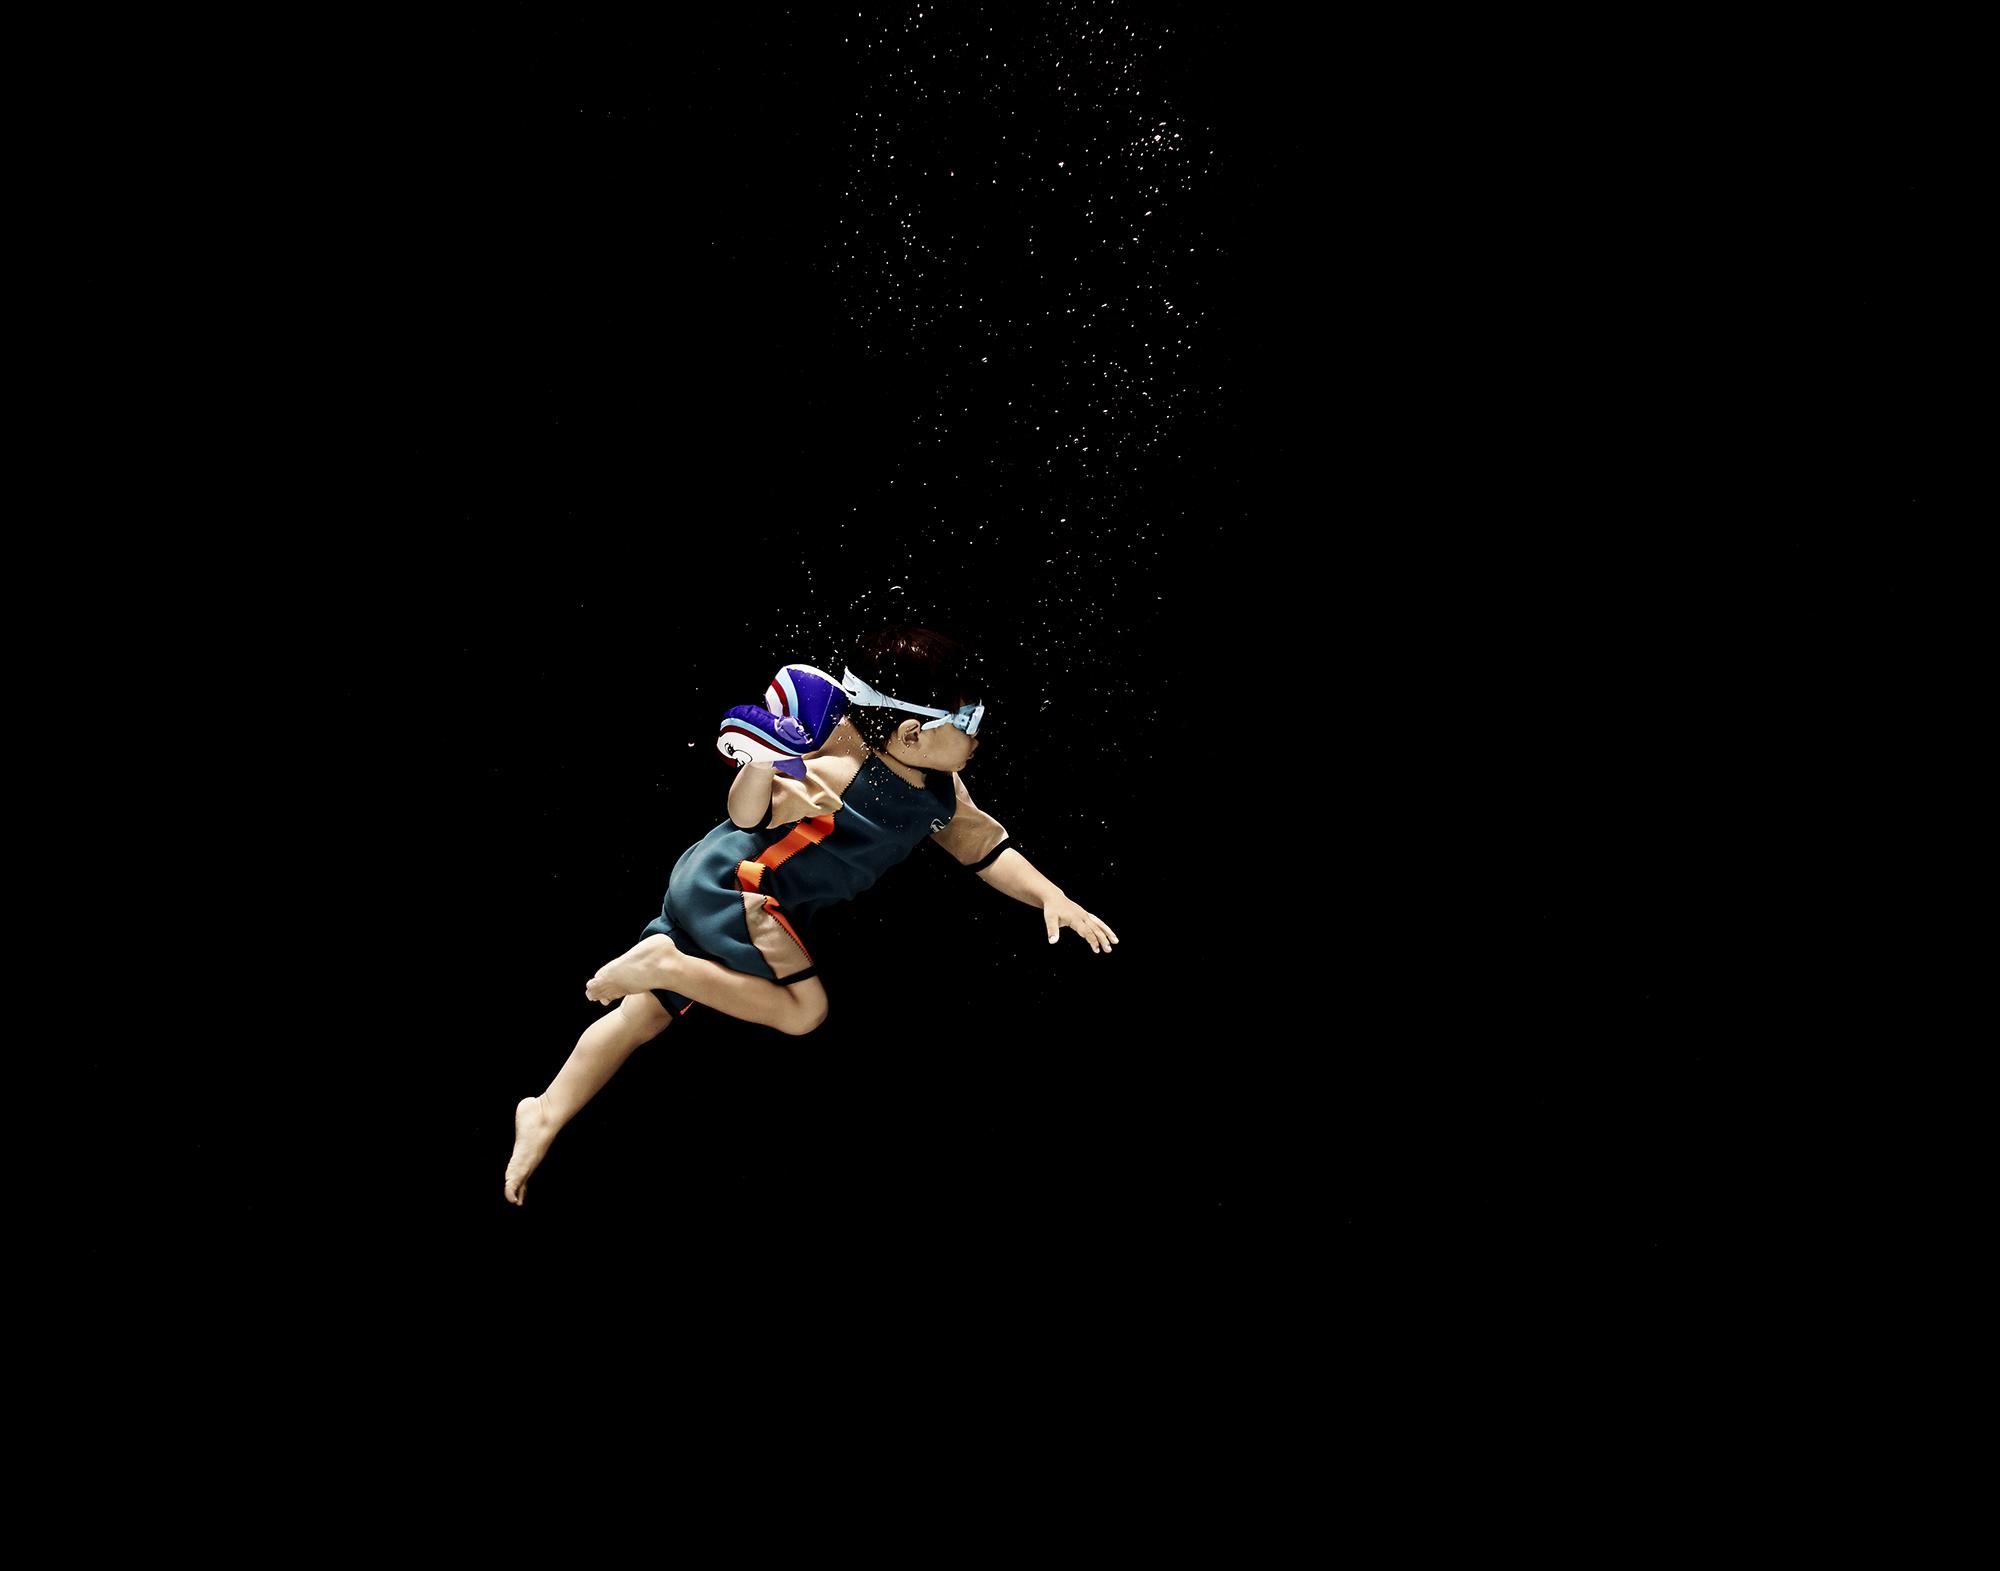 UnderwaterBaby-482v2.jpg